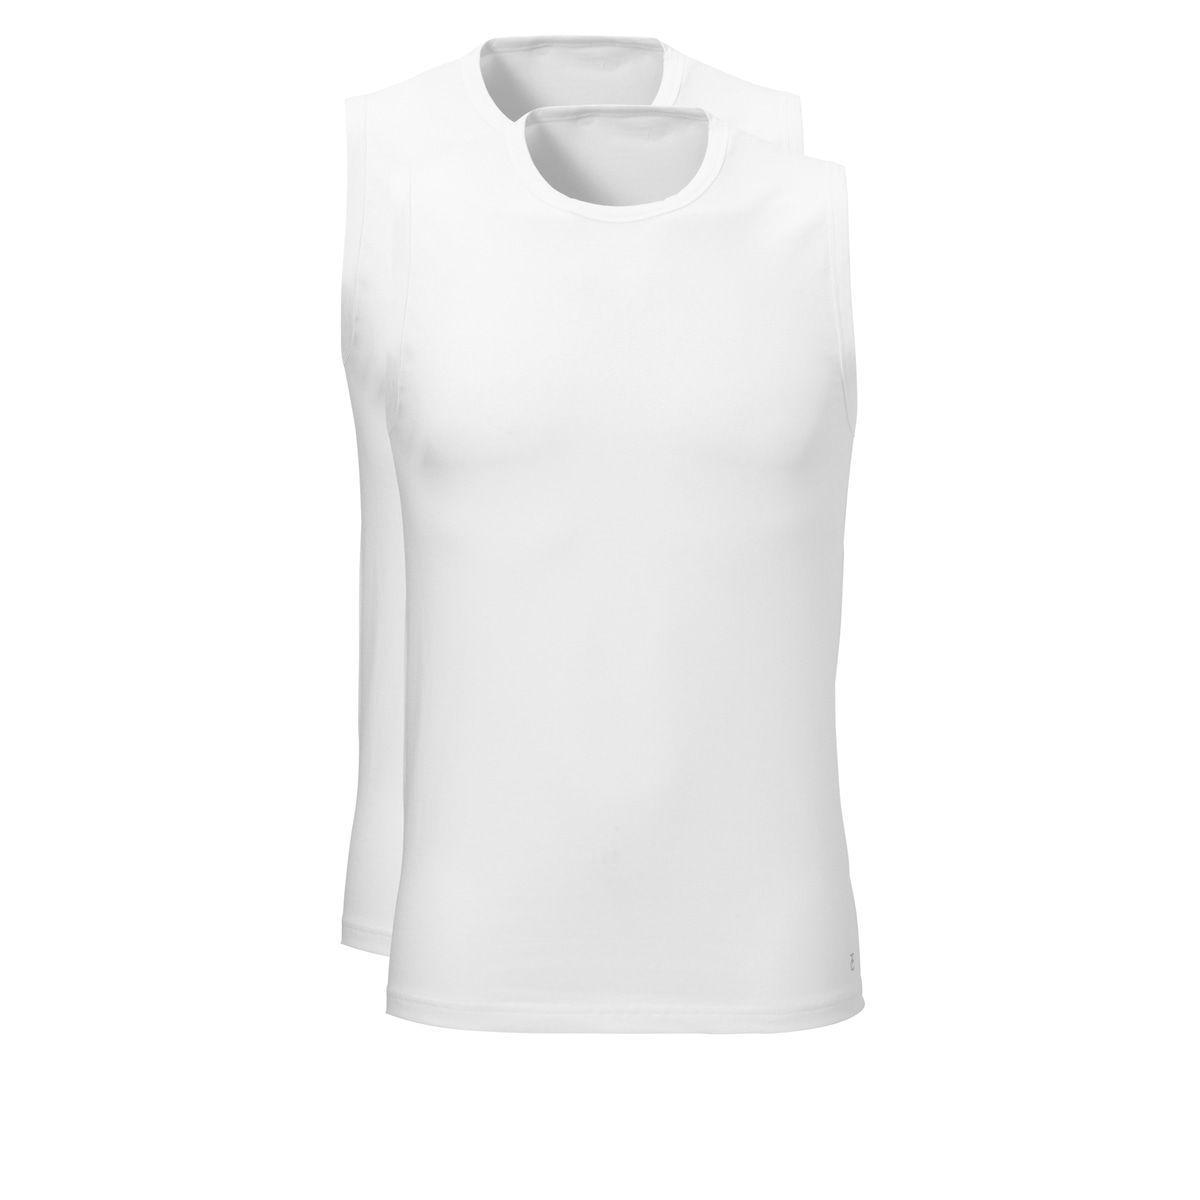 Ten Cate Tender Cotton Shirt Sleeveless 2-pack Wit